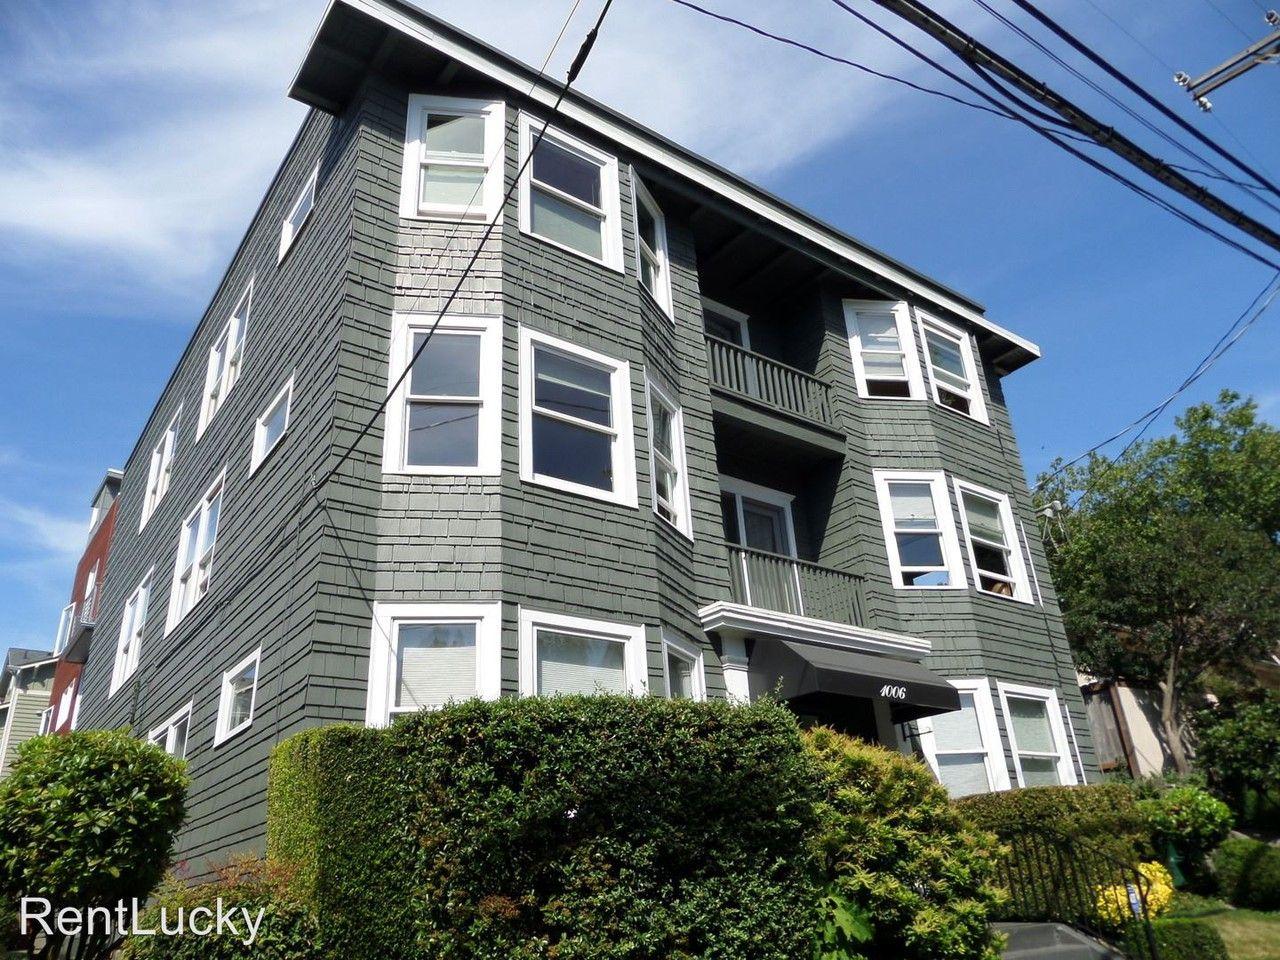 1006 E Prospect St Apartments For Rent 1006 E Prospect